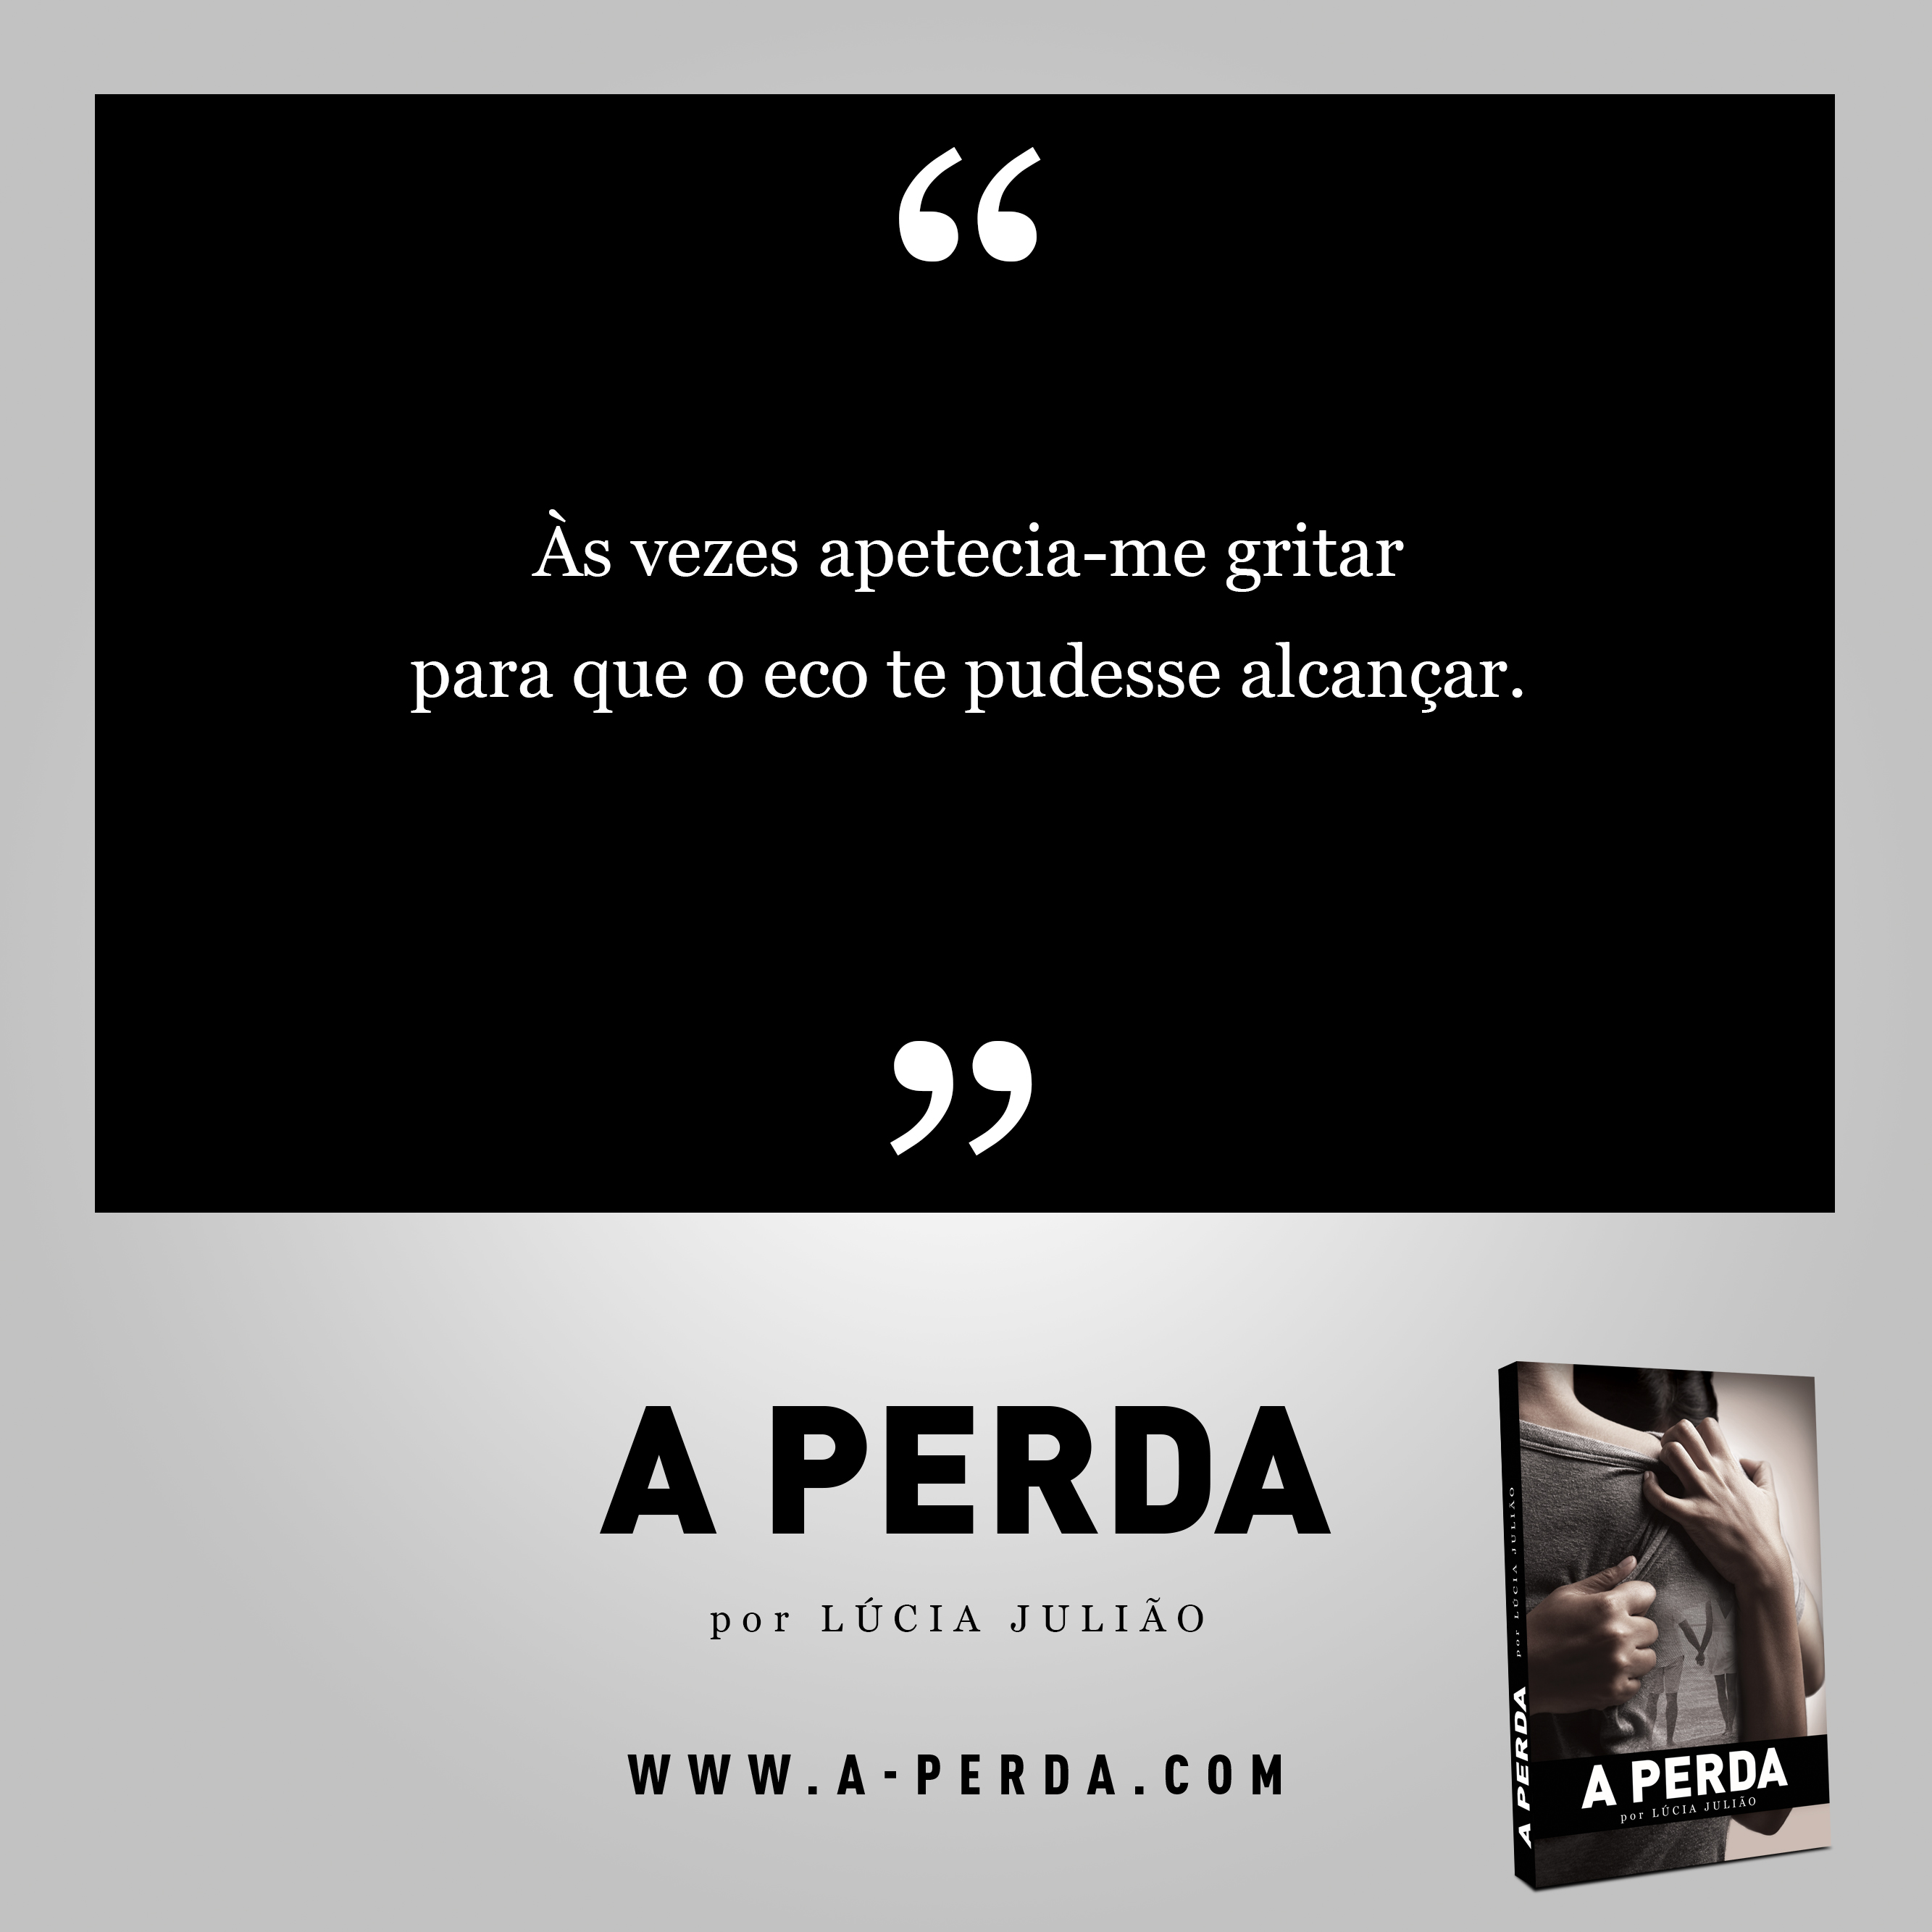 030-capitulo-11-livro-a-Perda-de-Lucia-Juliao-Instagram